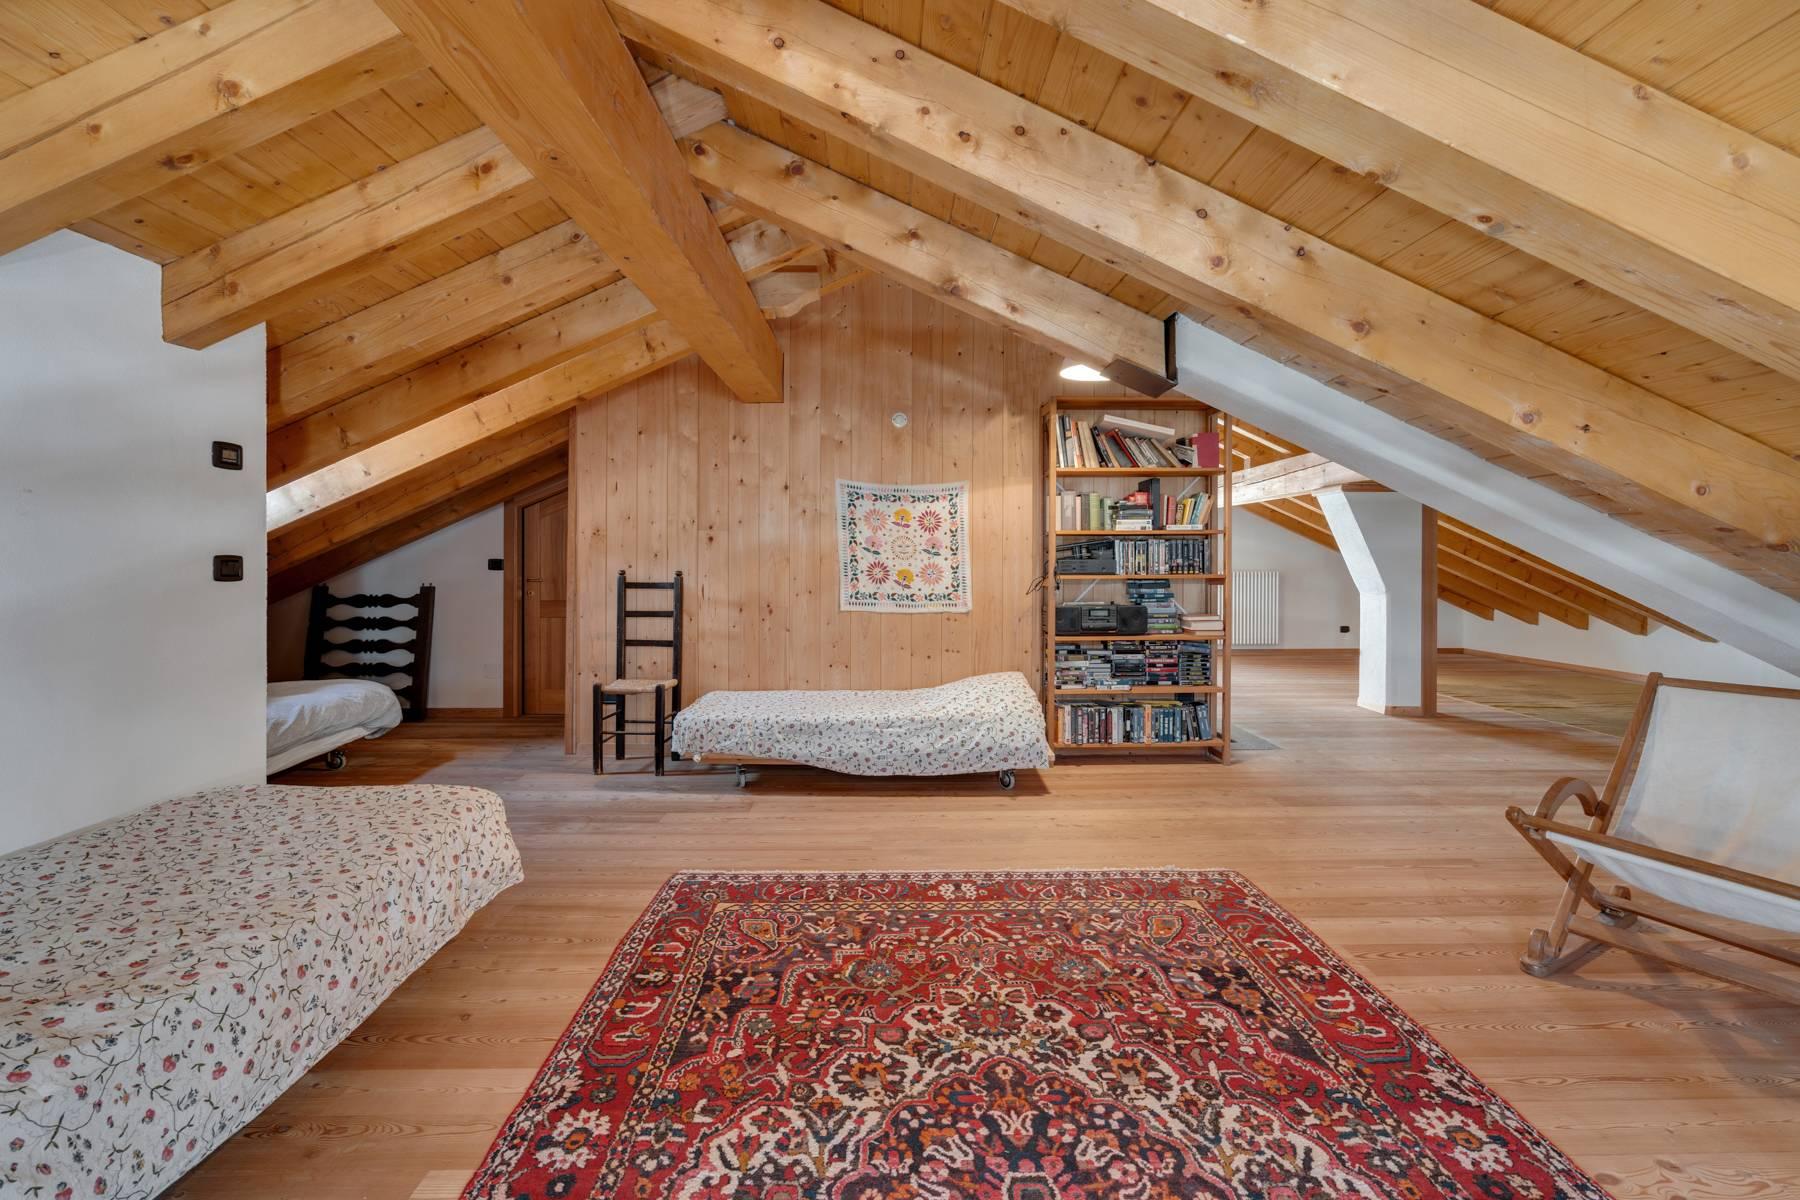 Villa in Vendita a Cogne: 5 locali, 384 mq - Foto 12